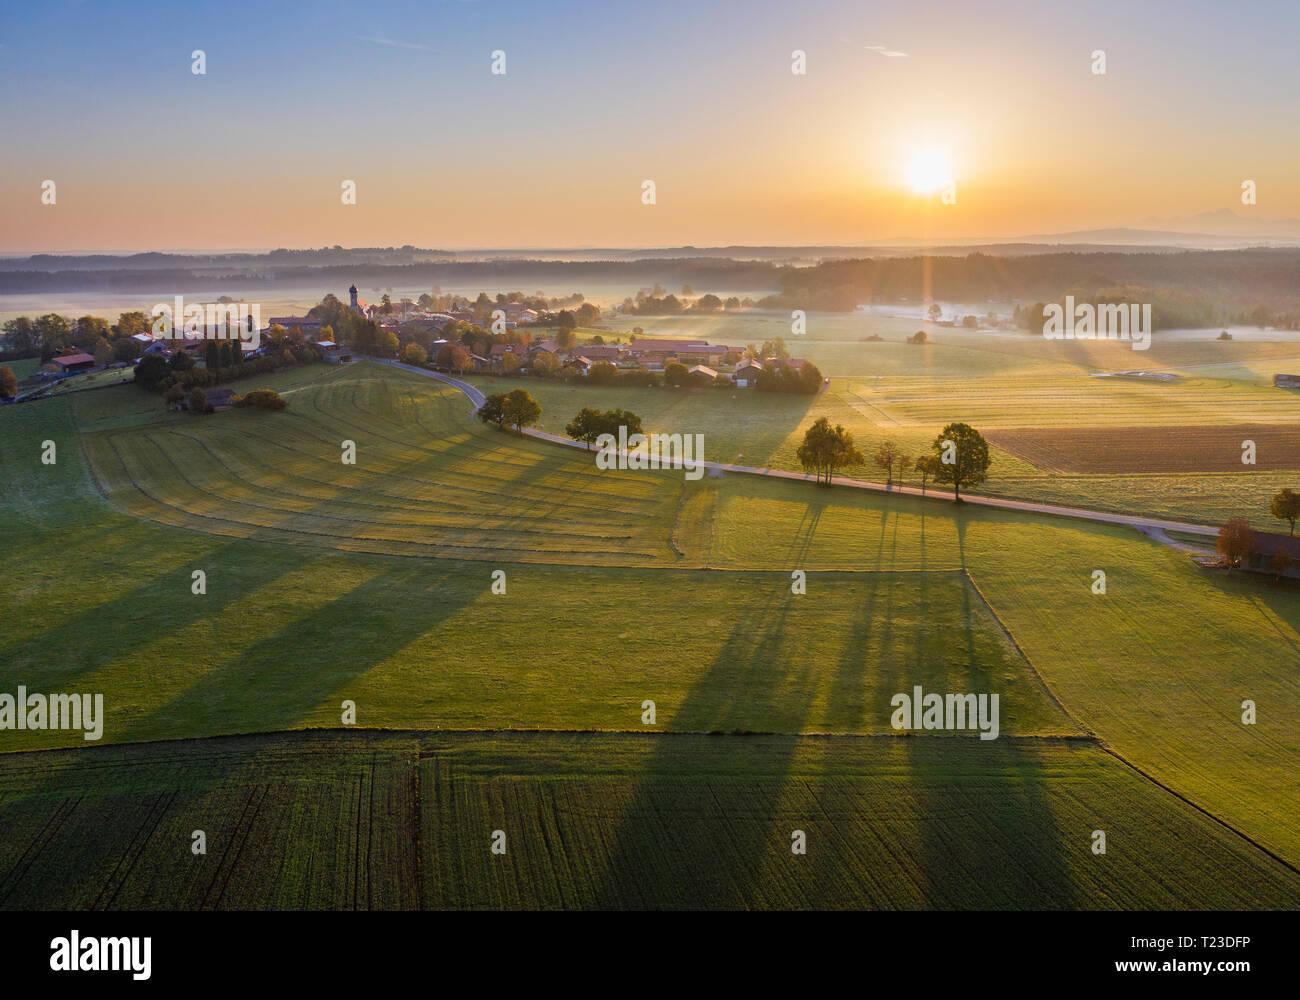 Germany, Bavaria, Lochen near Dietramszell, sunrise, drone view - Stock Image